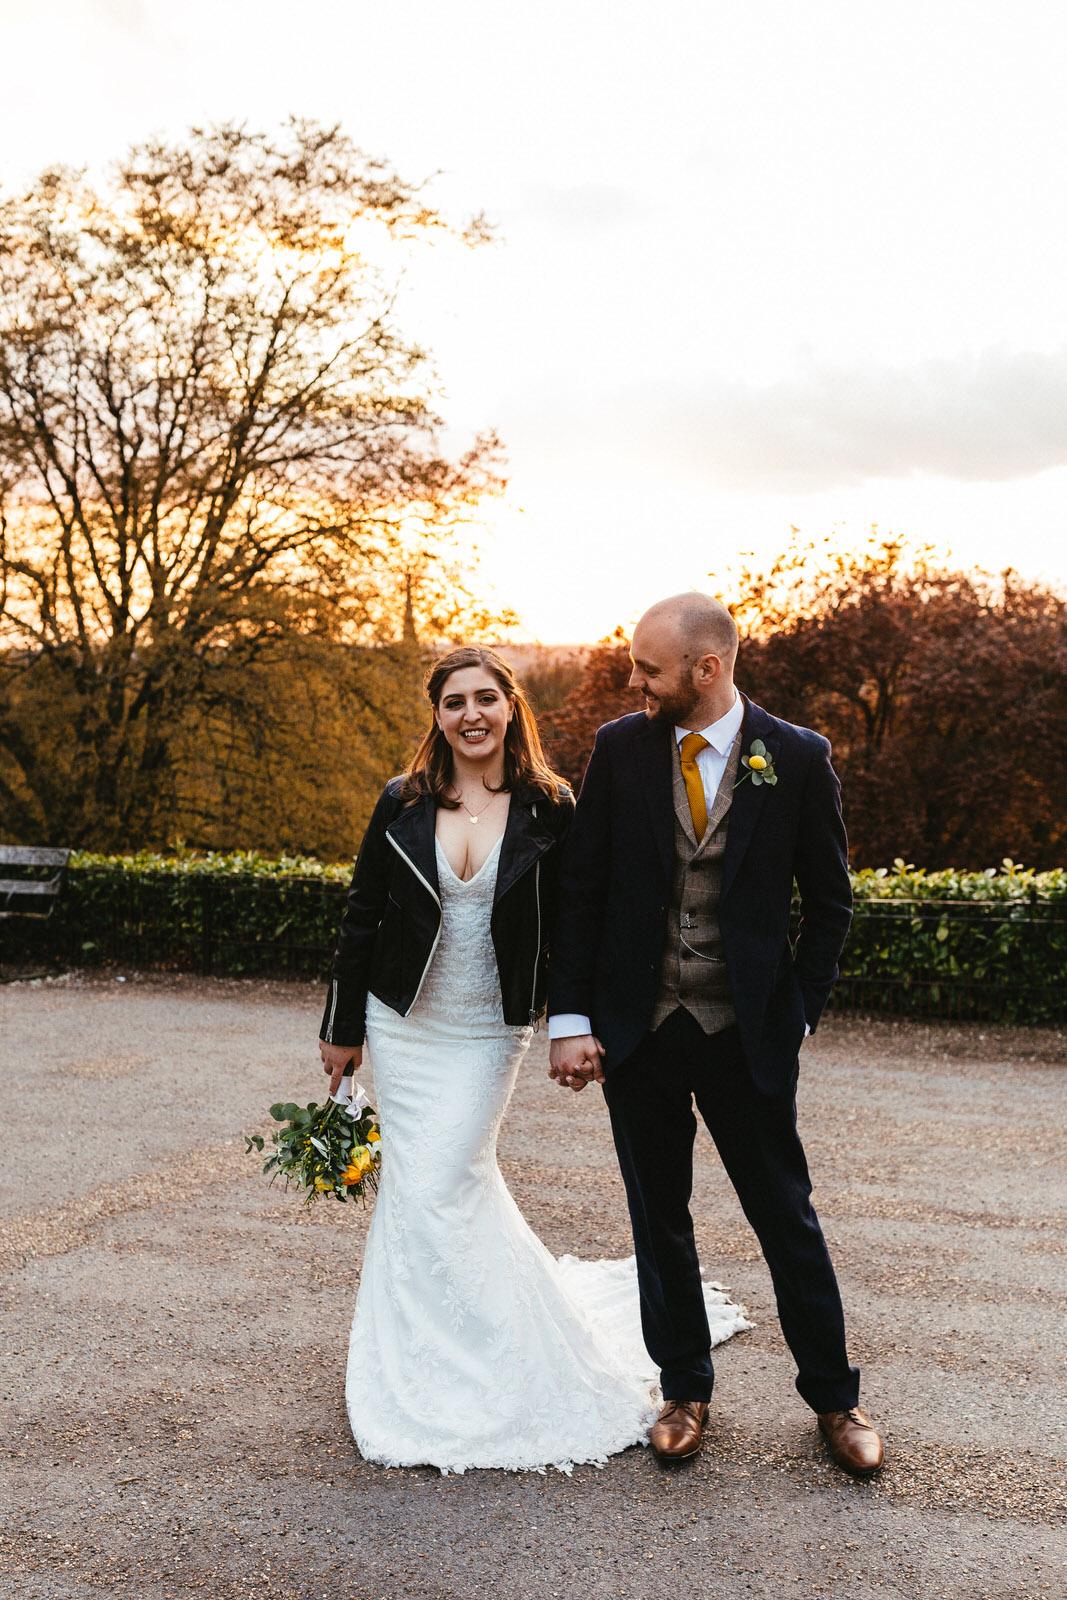 Jenni-and-James-Wedding-Highlights-48.jpg